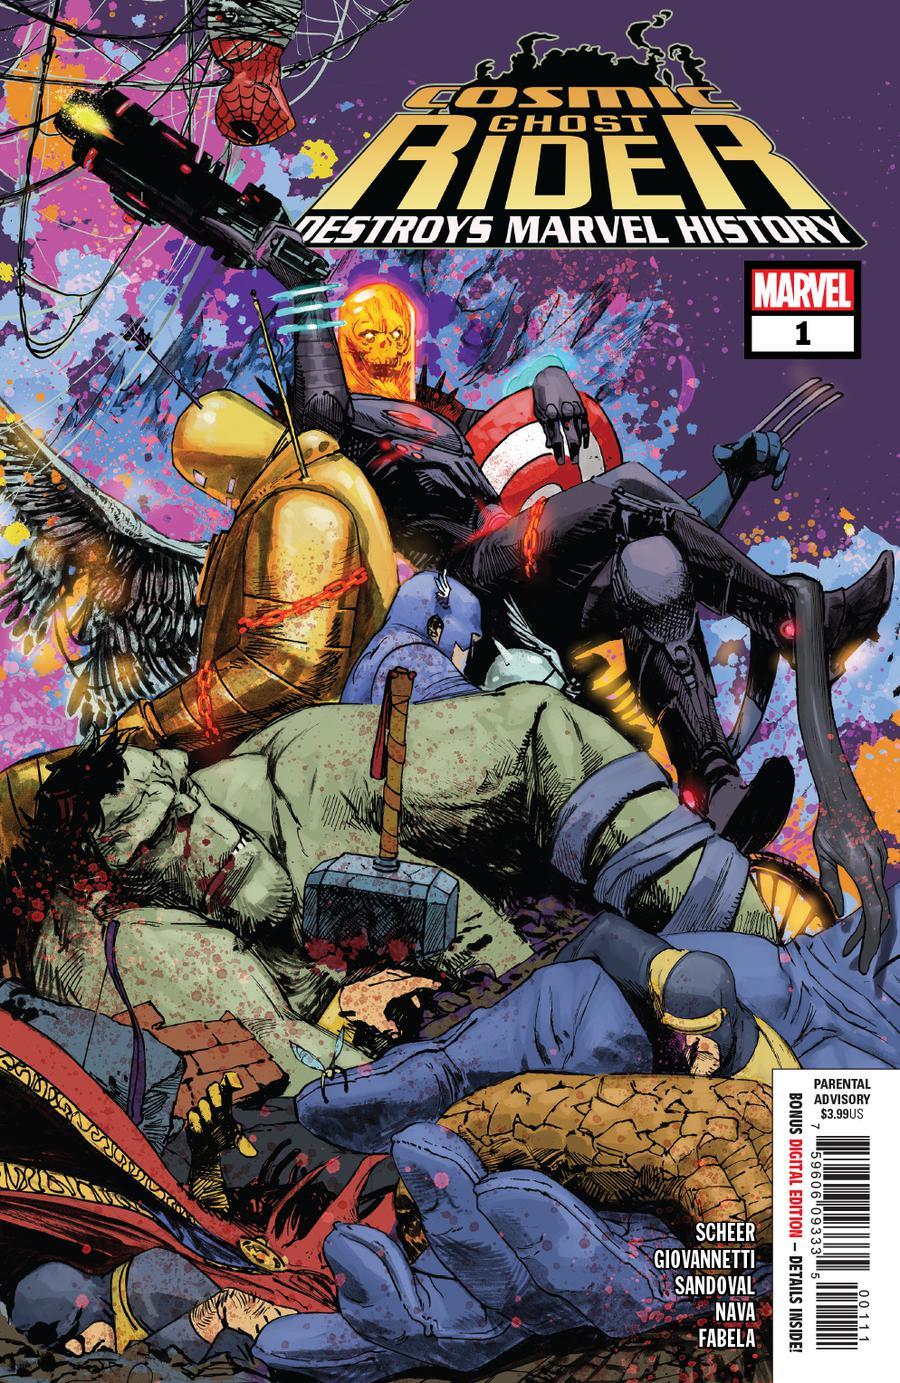 Cosmic Ghost Rider Destroys Marvel History #1 Cover A 1st Ptg Regular Gerardo Zaffino Cover